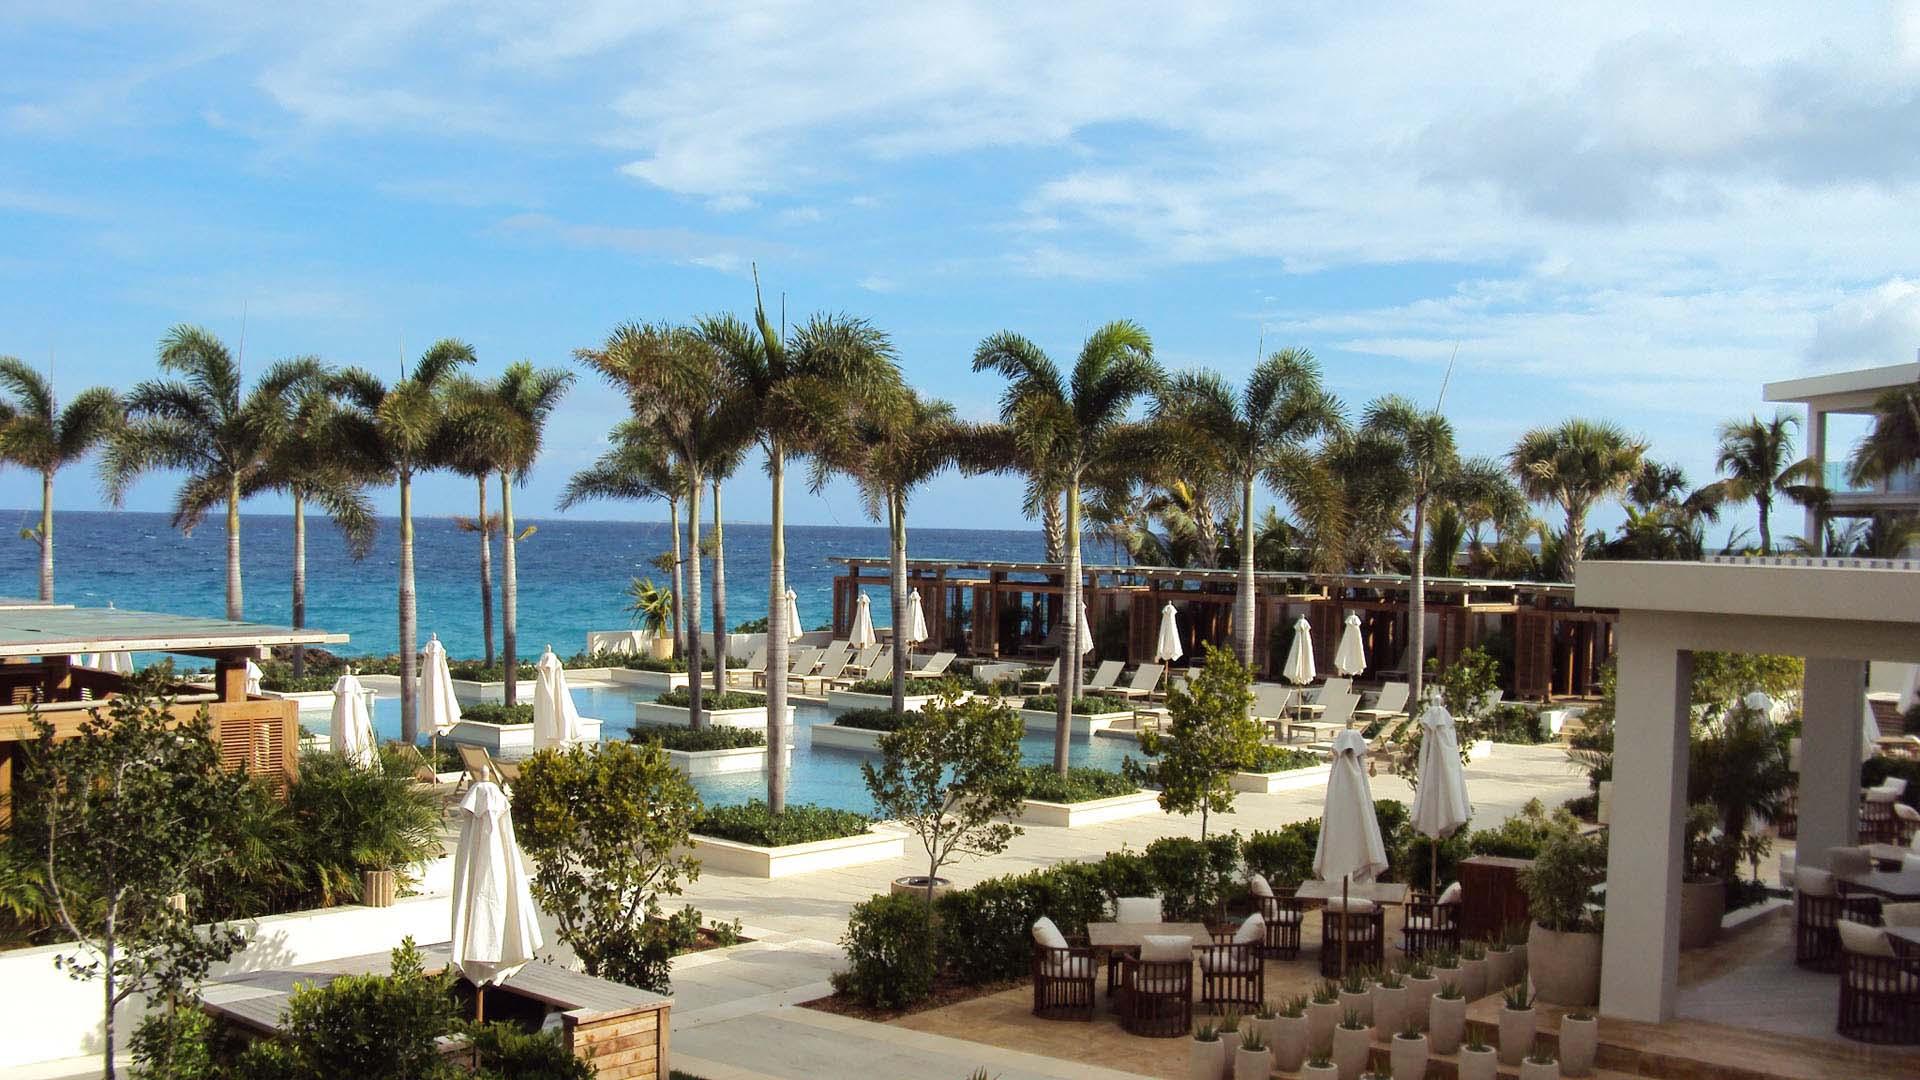 viceroy-anguilla-pool-deck-932.jpg